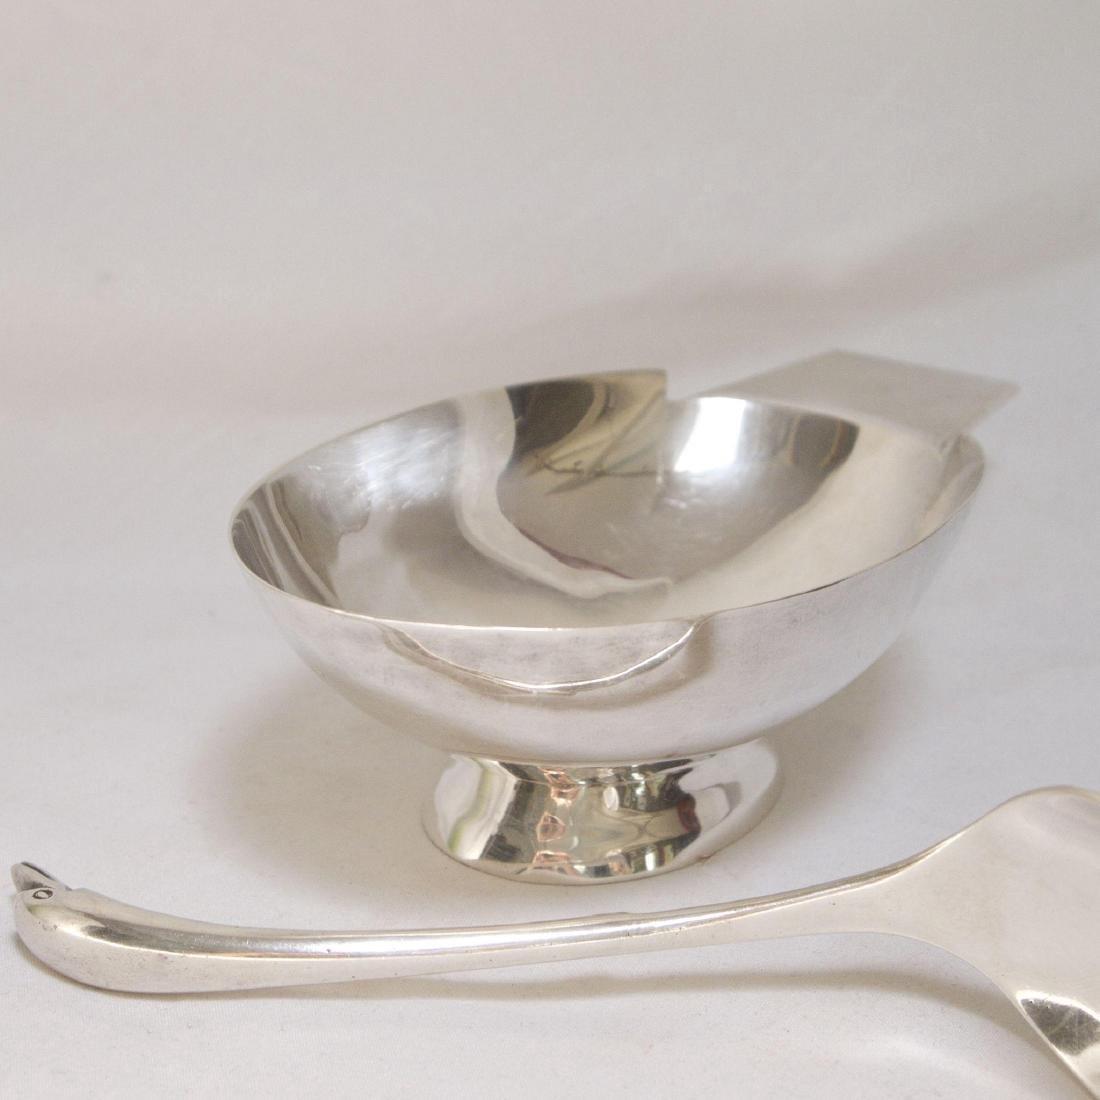 Mid Century Modern Sterling Silver Gravy Bowl & Spoon - 2